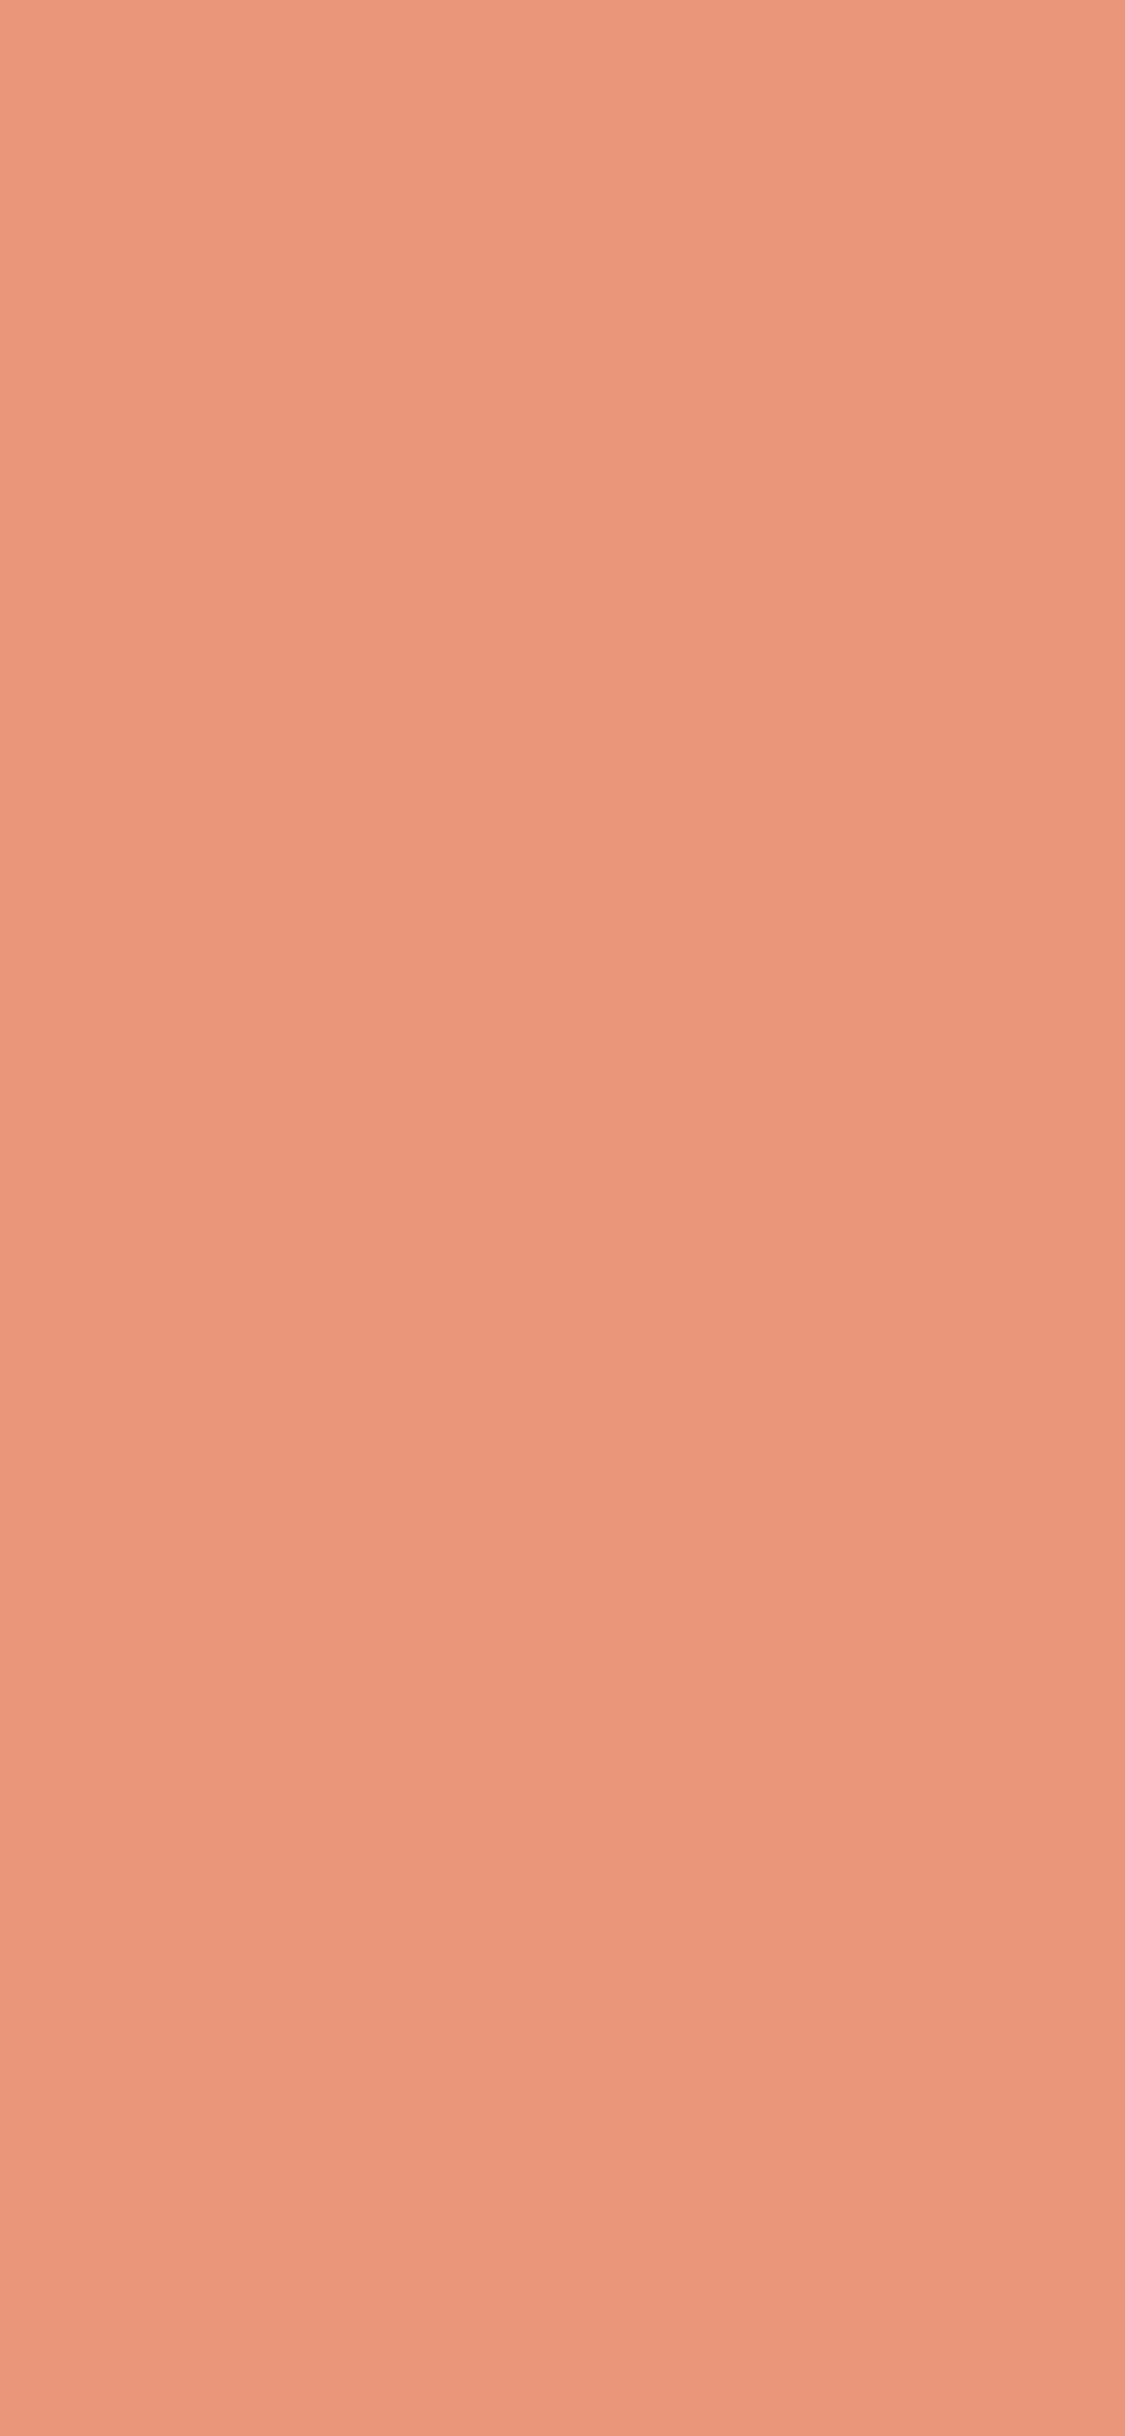 1125x2436 Dark Salmon Solid Color Background